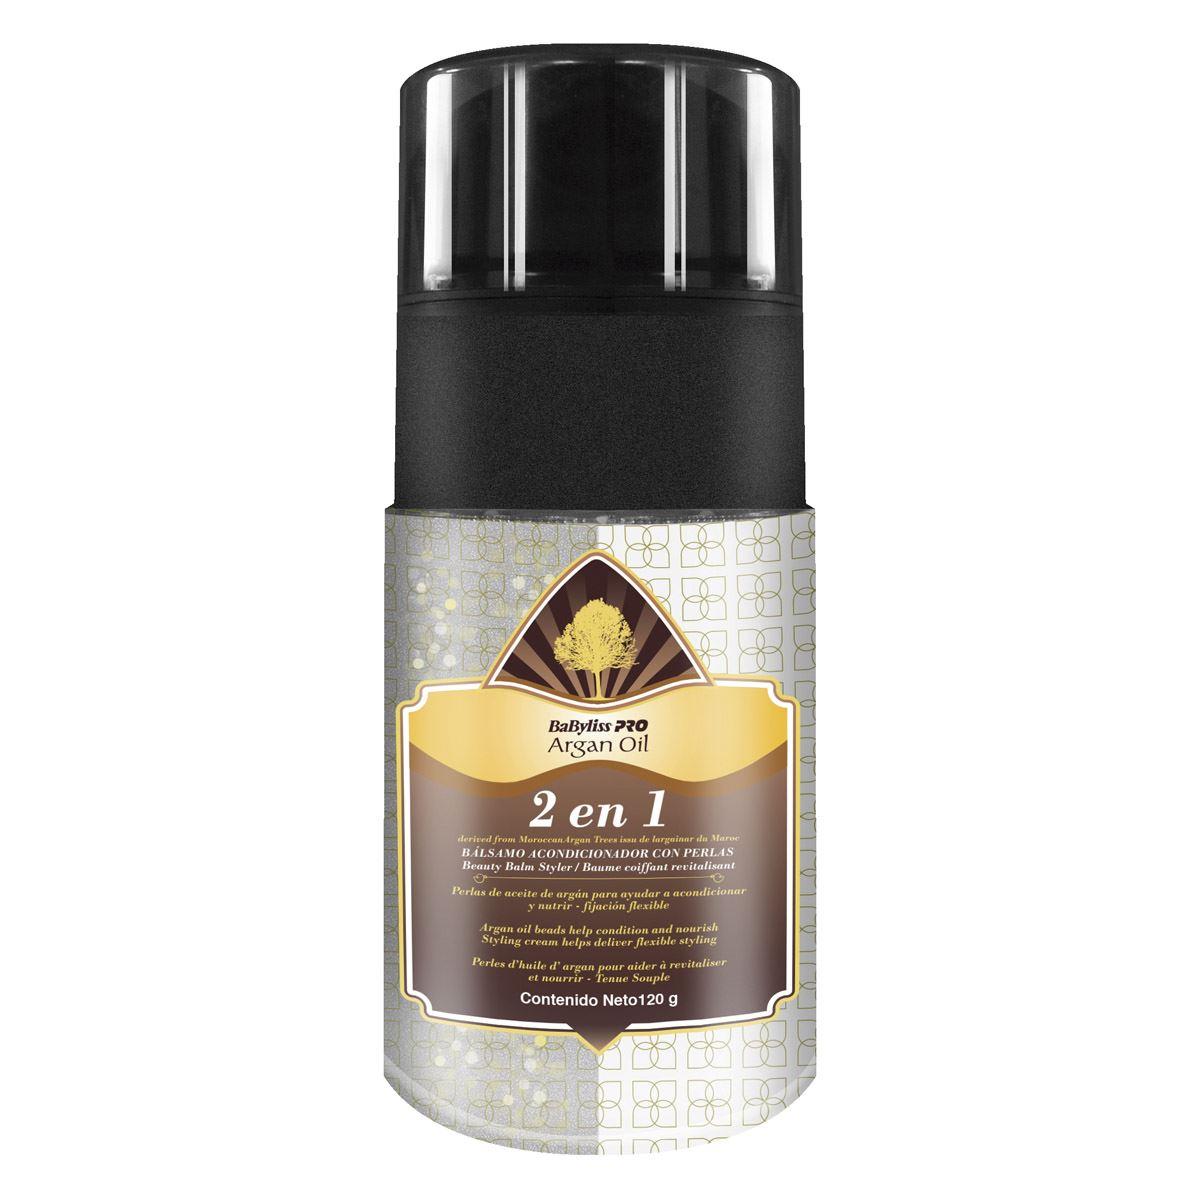 Balsamo Estilizador 2 en 1 Crema / Aceite